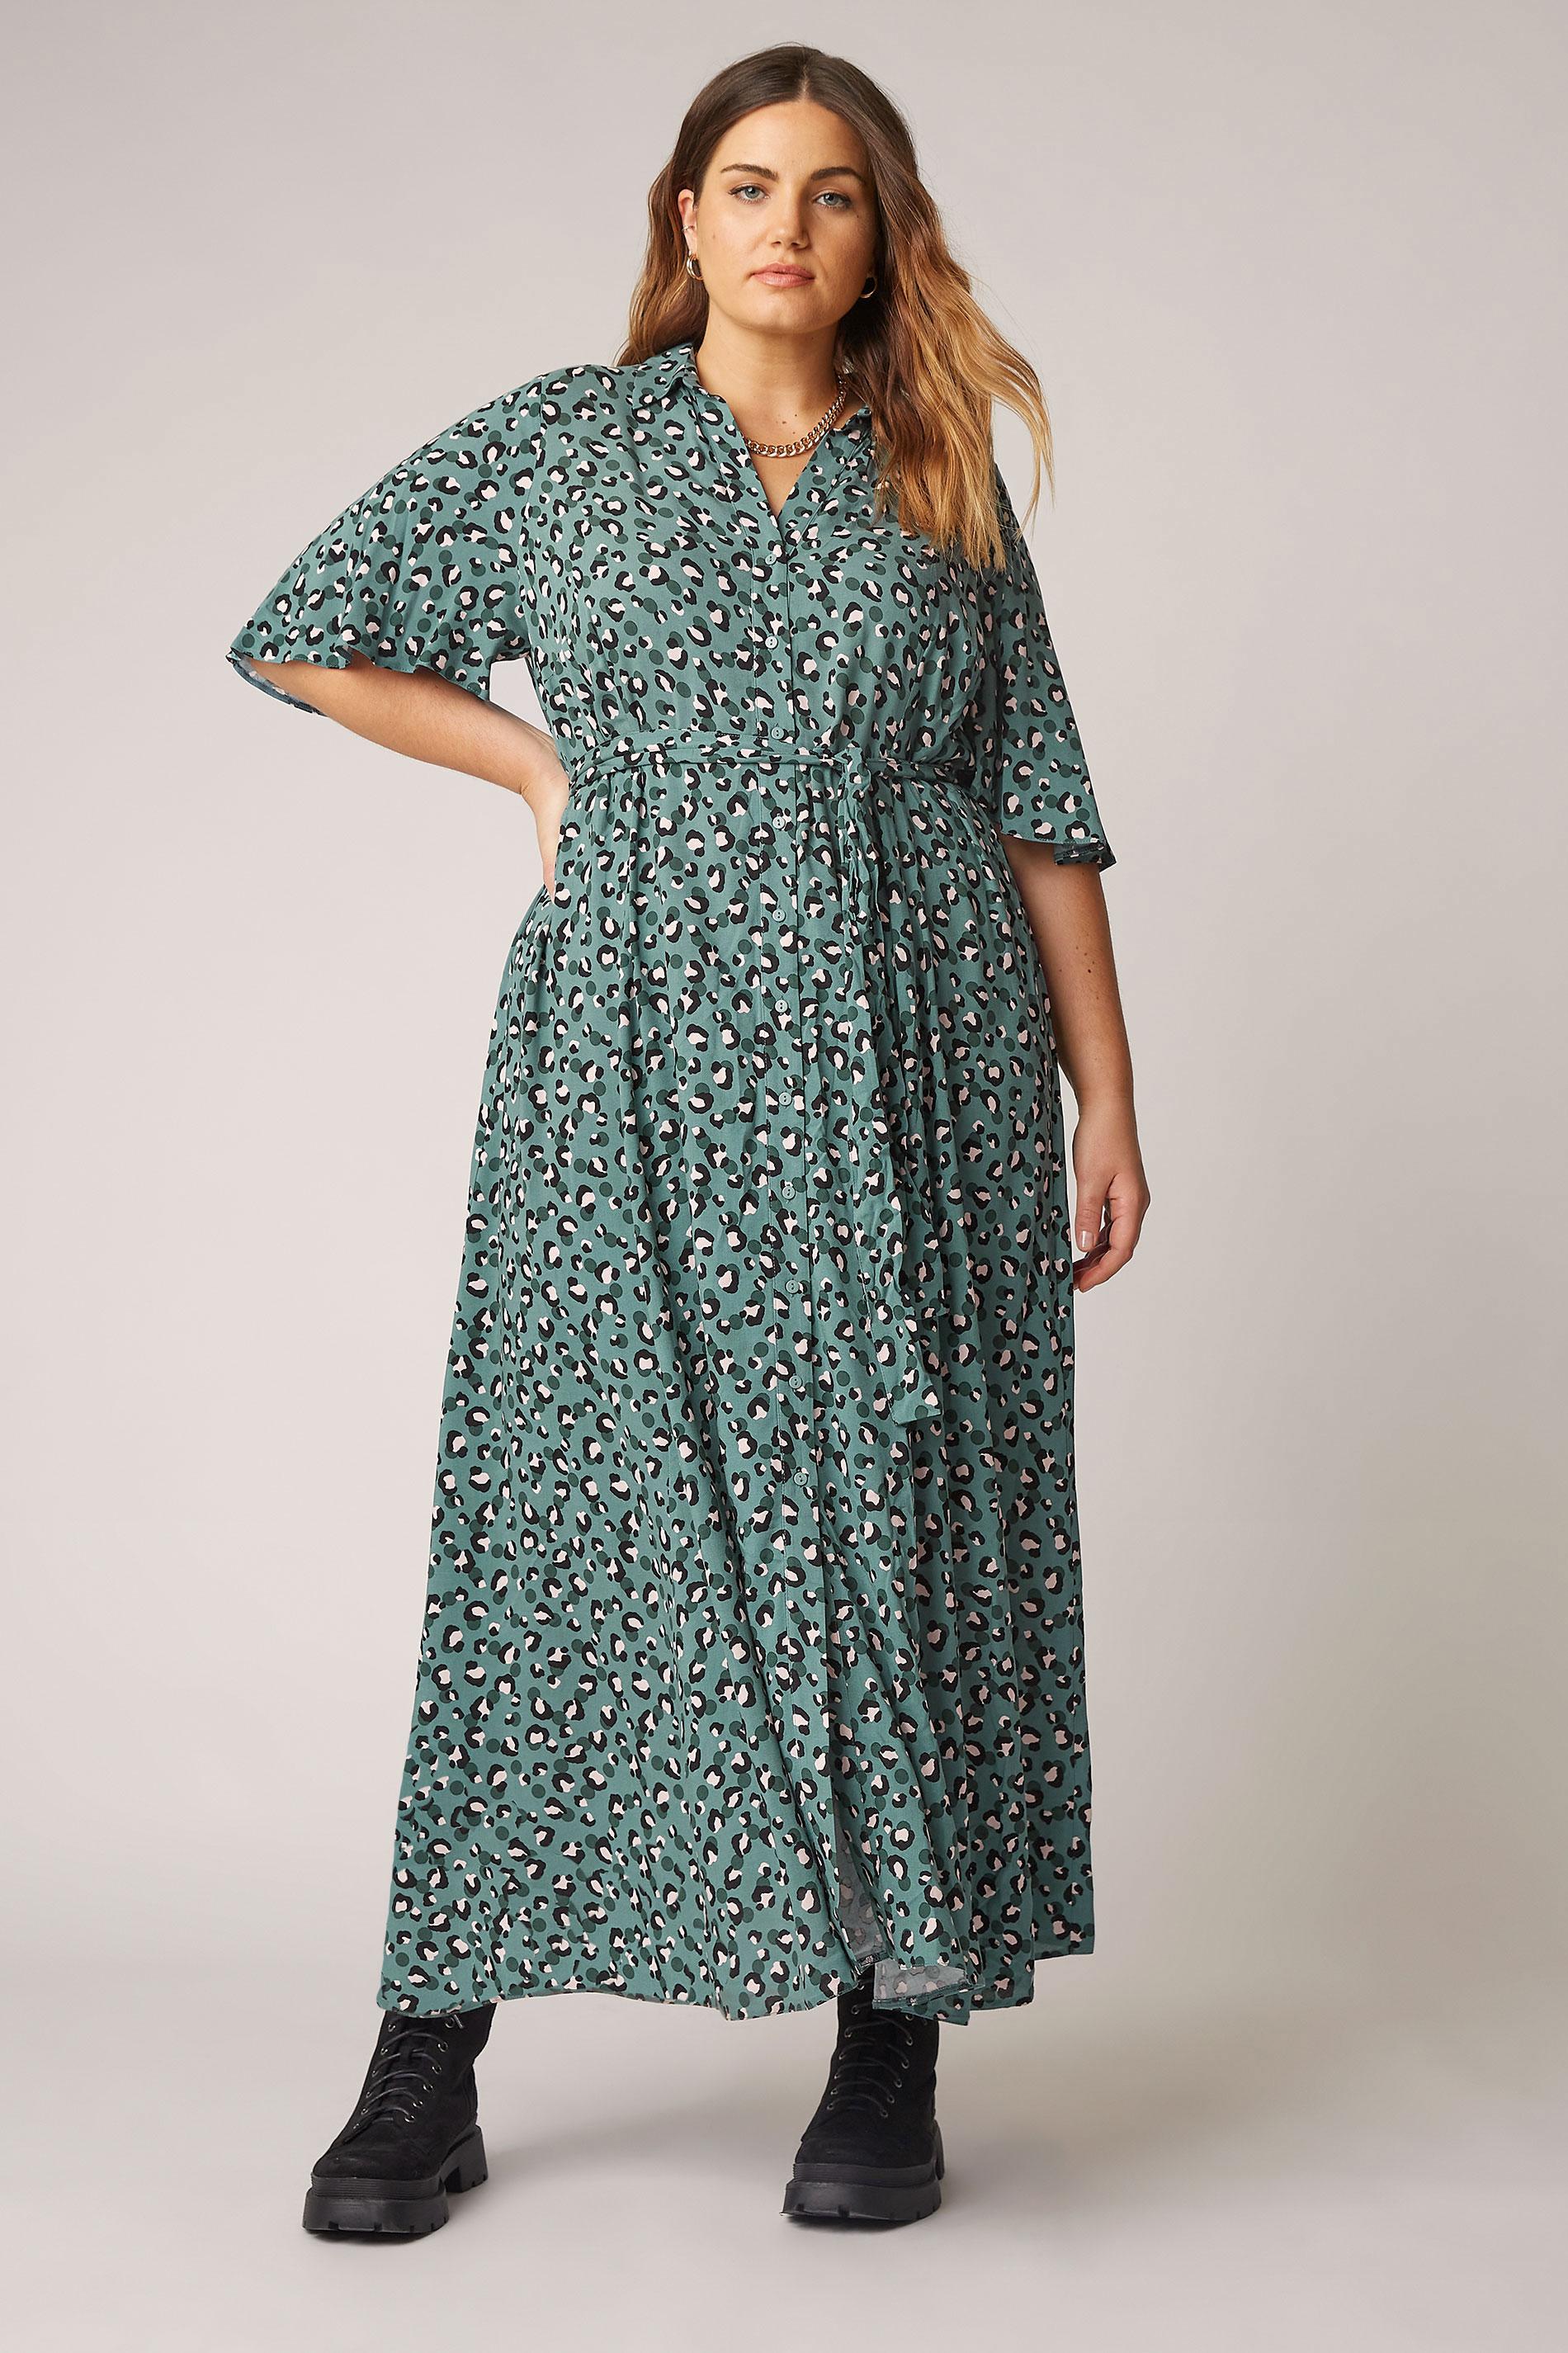 THE LIMITED EDIT Teal Leopard Print Shirt Maxi Dress_A.jpg